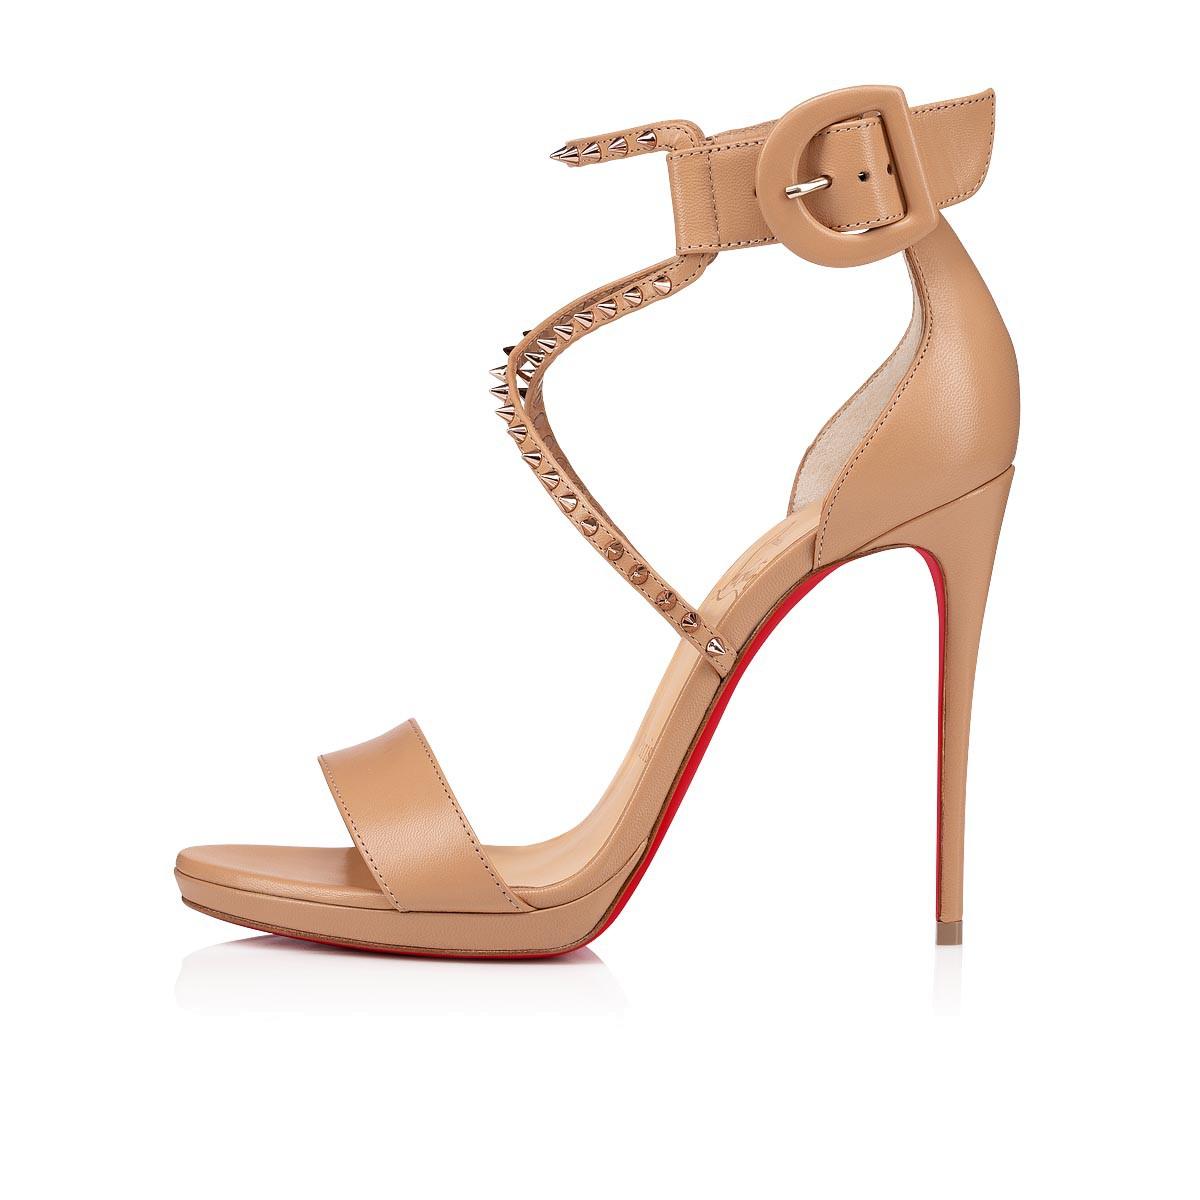 Shoes - Choca Lux - Christian Louboutin